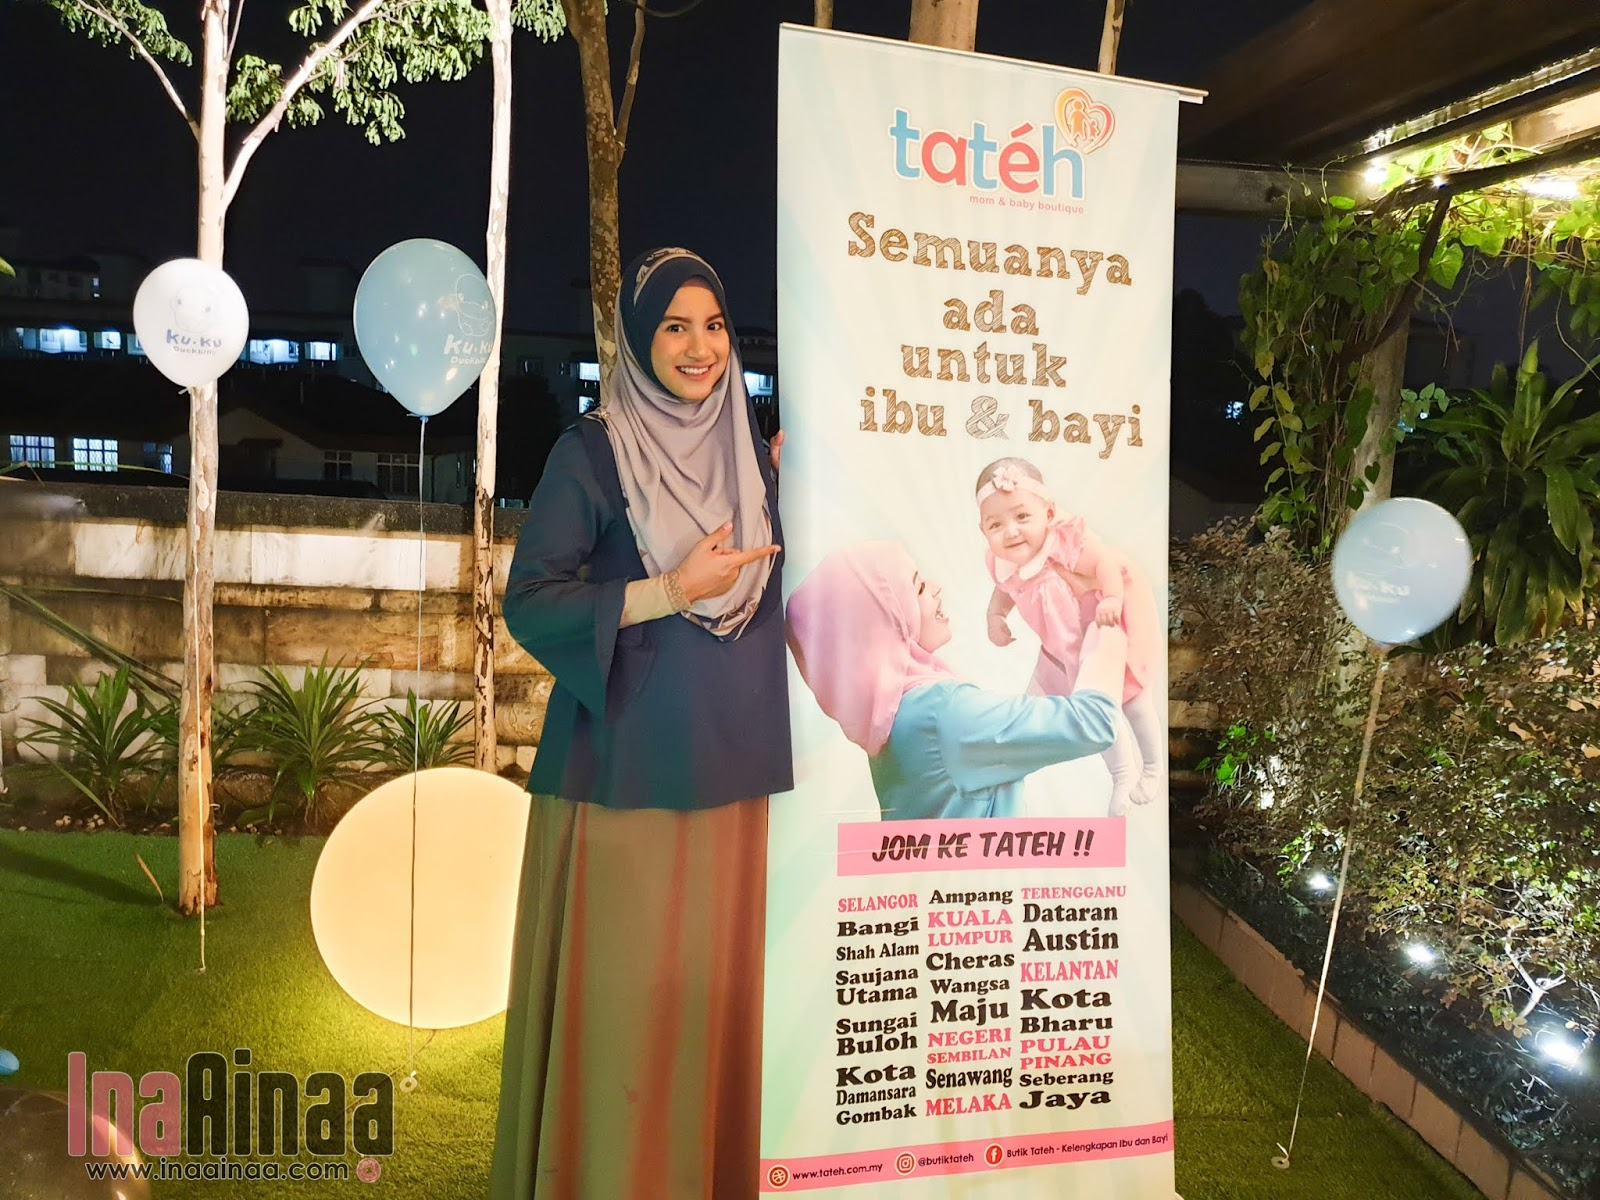 KUKU DUCKBILL MALAYSIA - Hak Milik Ina Ainaa